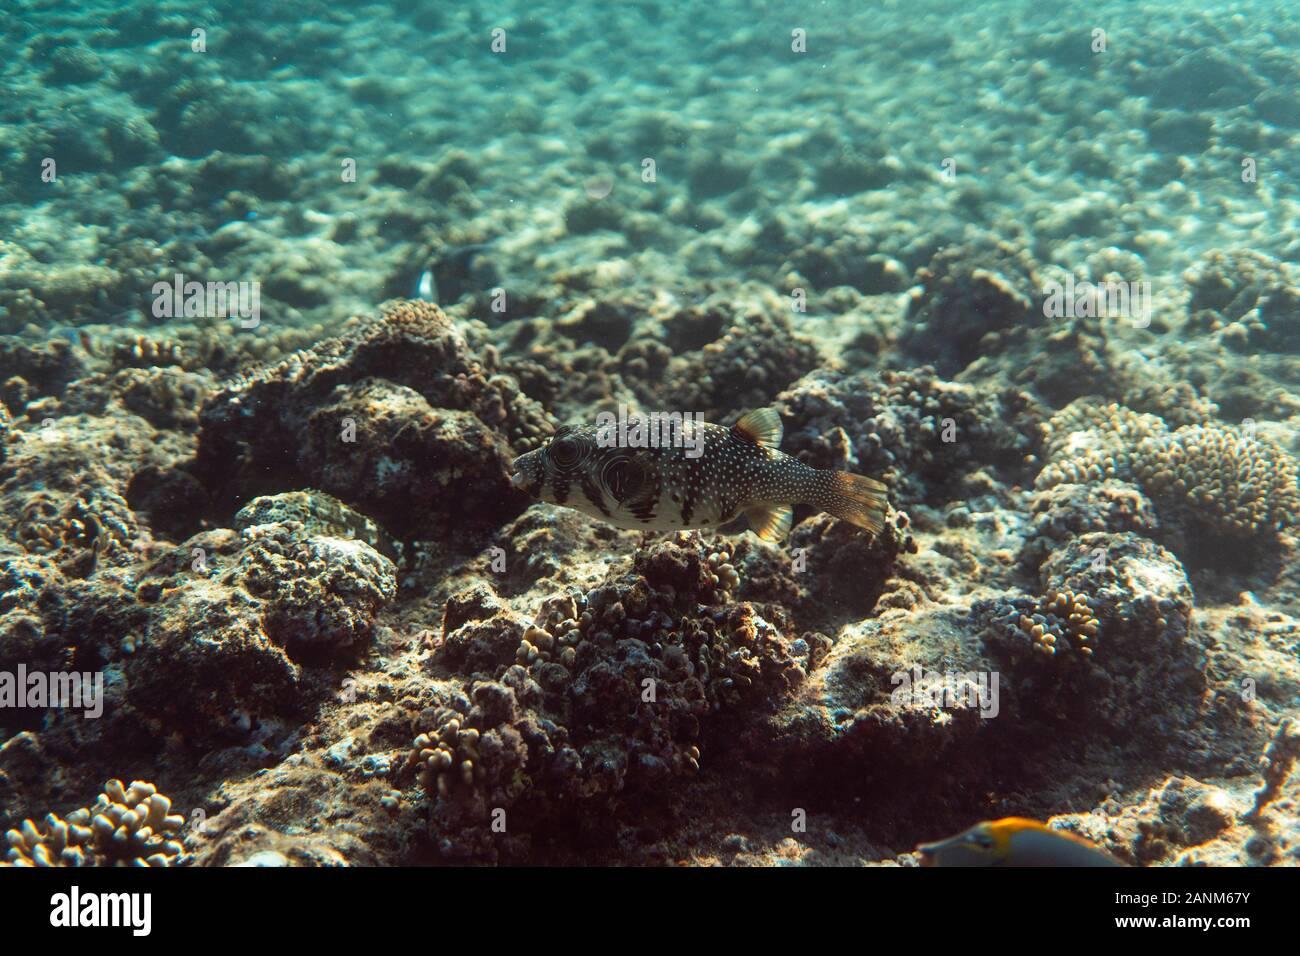 arothron stellatus underwater in the ocean of egypt, underwater in the ocean of egypt, arothron stellatus underwater photograph underwater photograph, Stock Photo